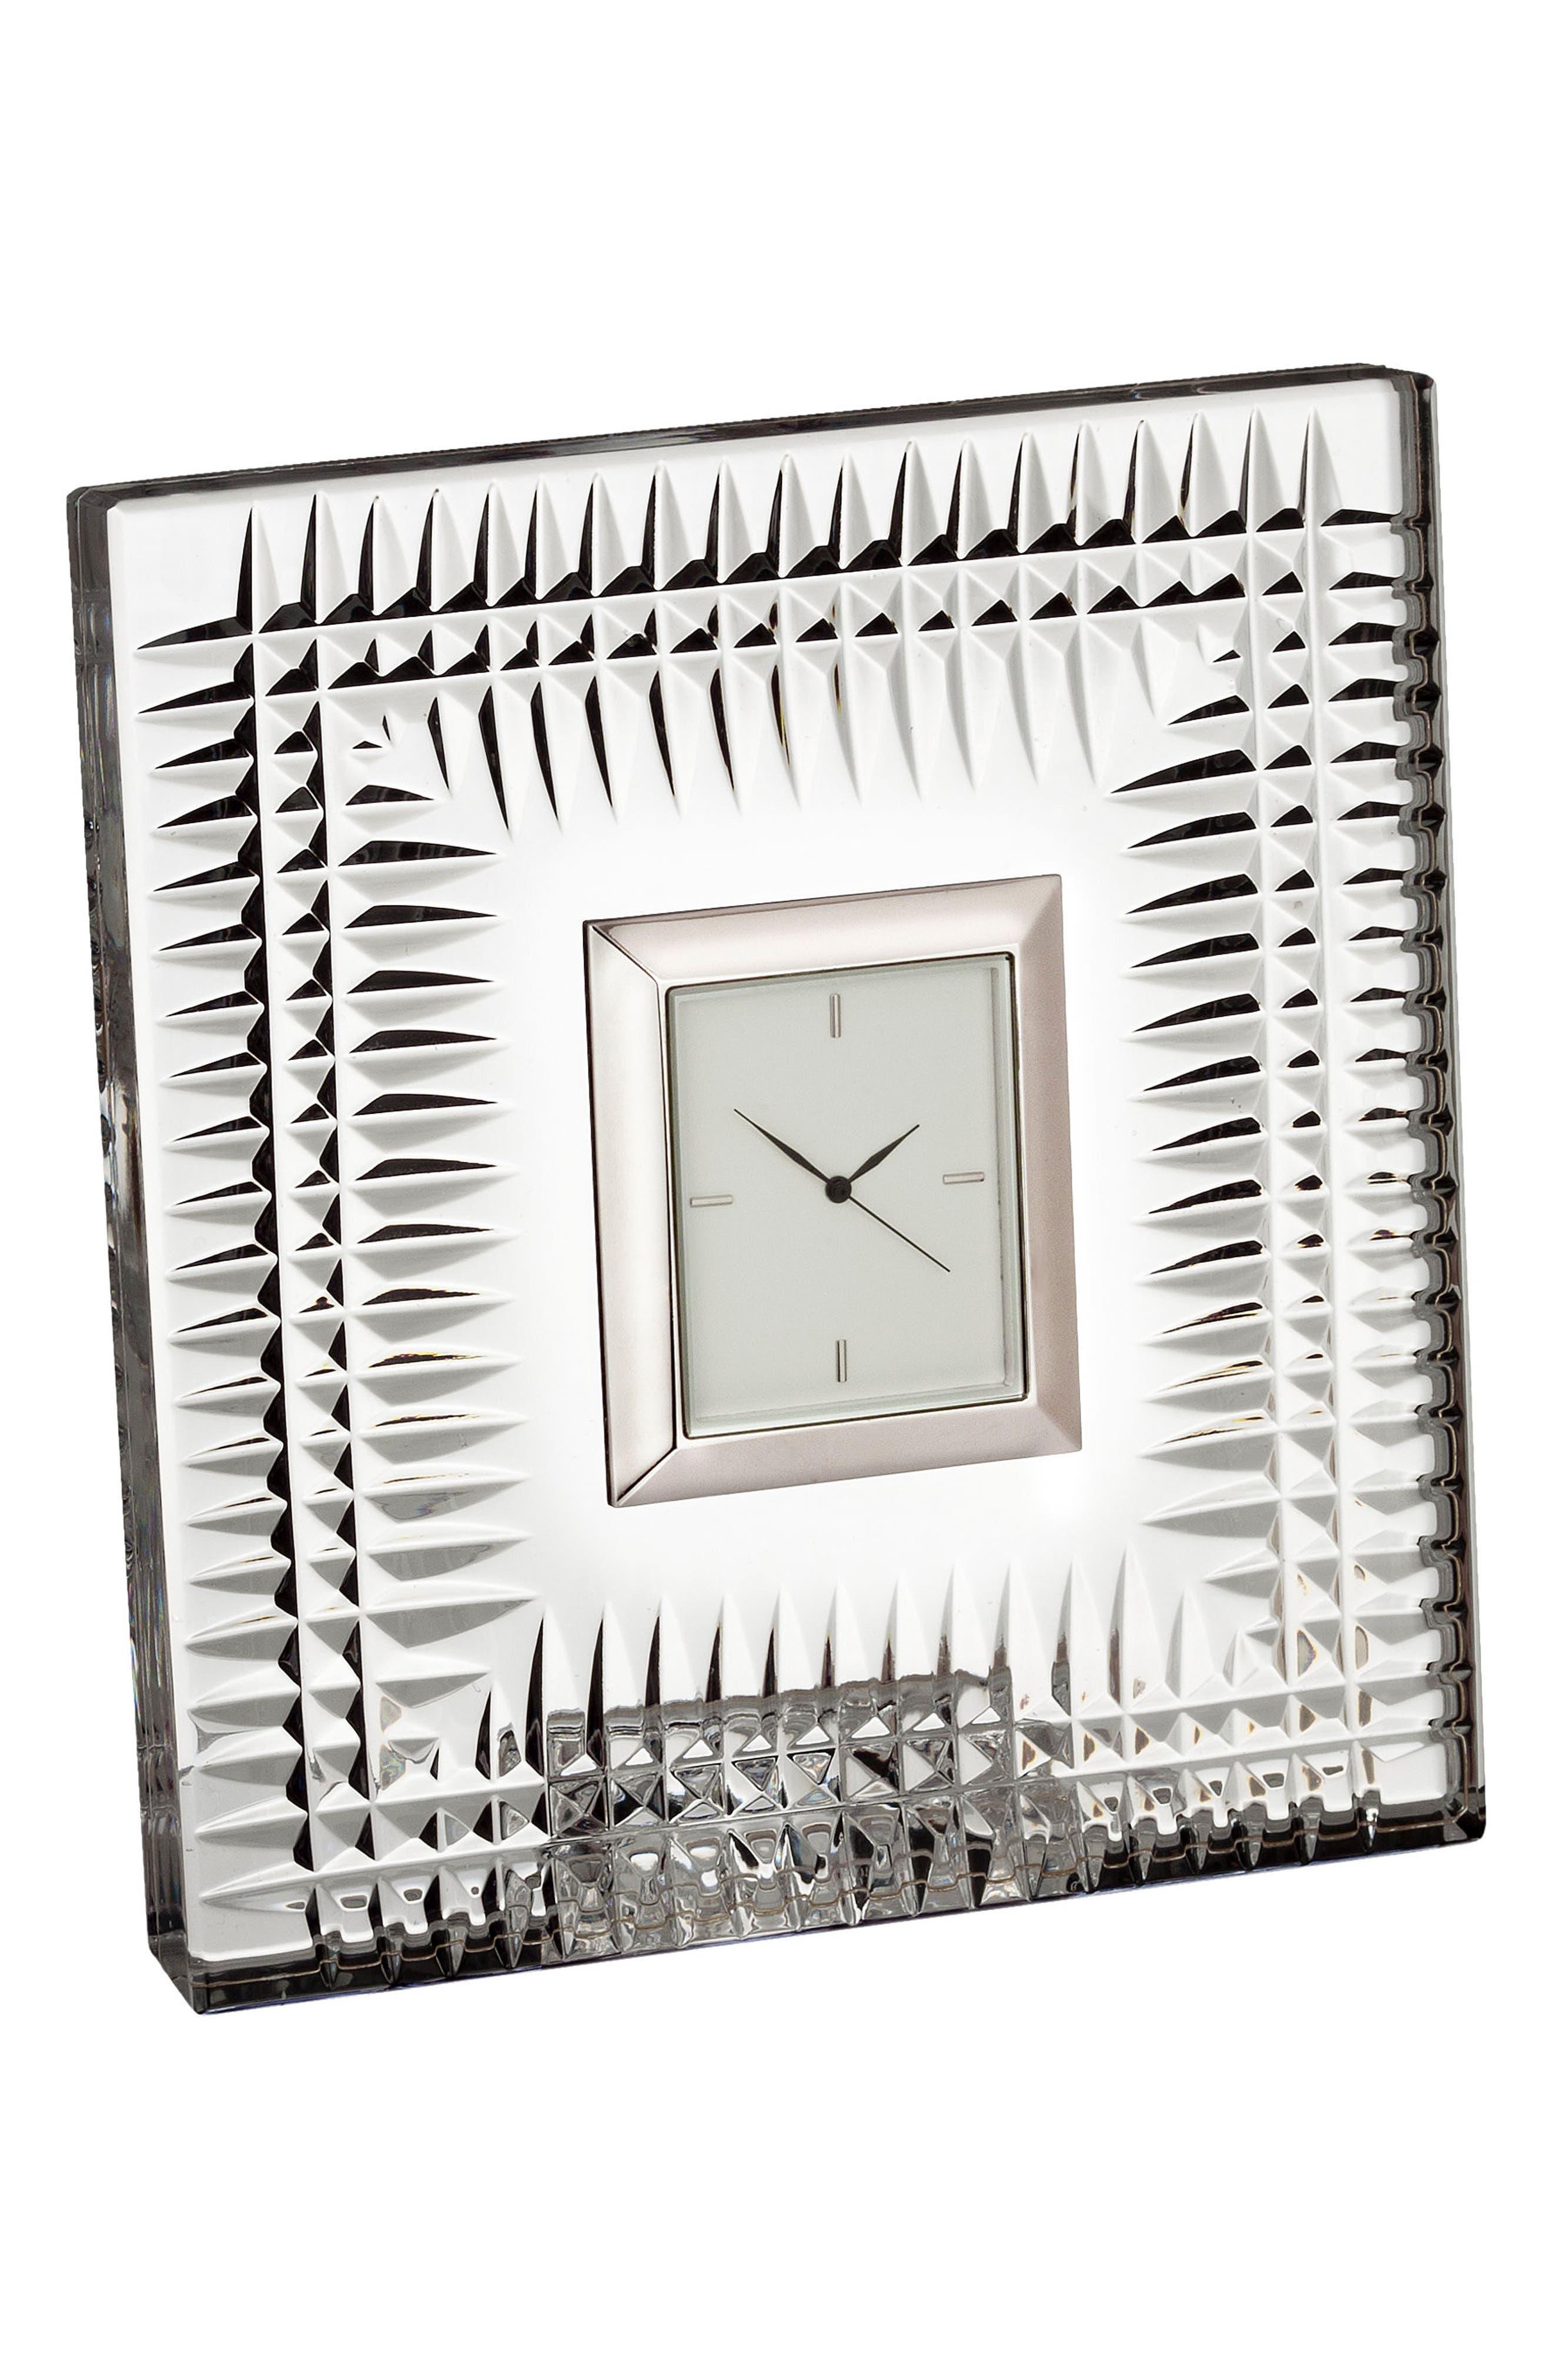 Alternate Image 1 Selected - Waterford Lismore Diamond Crystal Clock